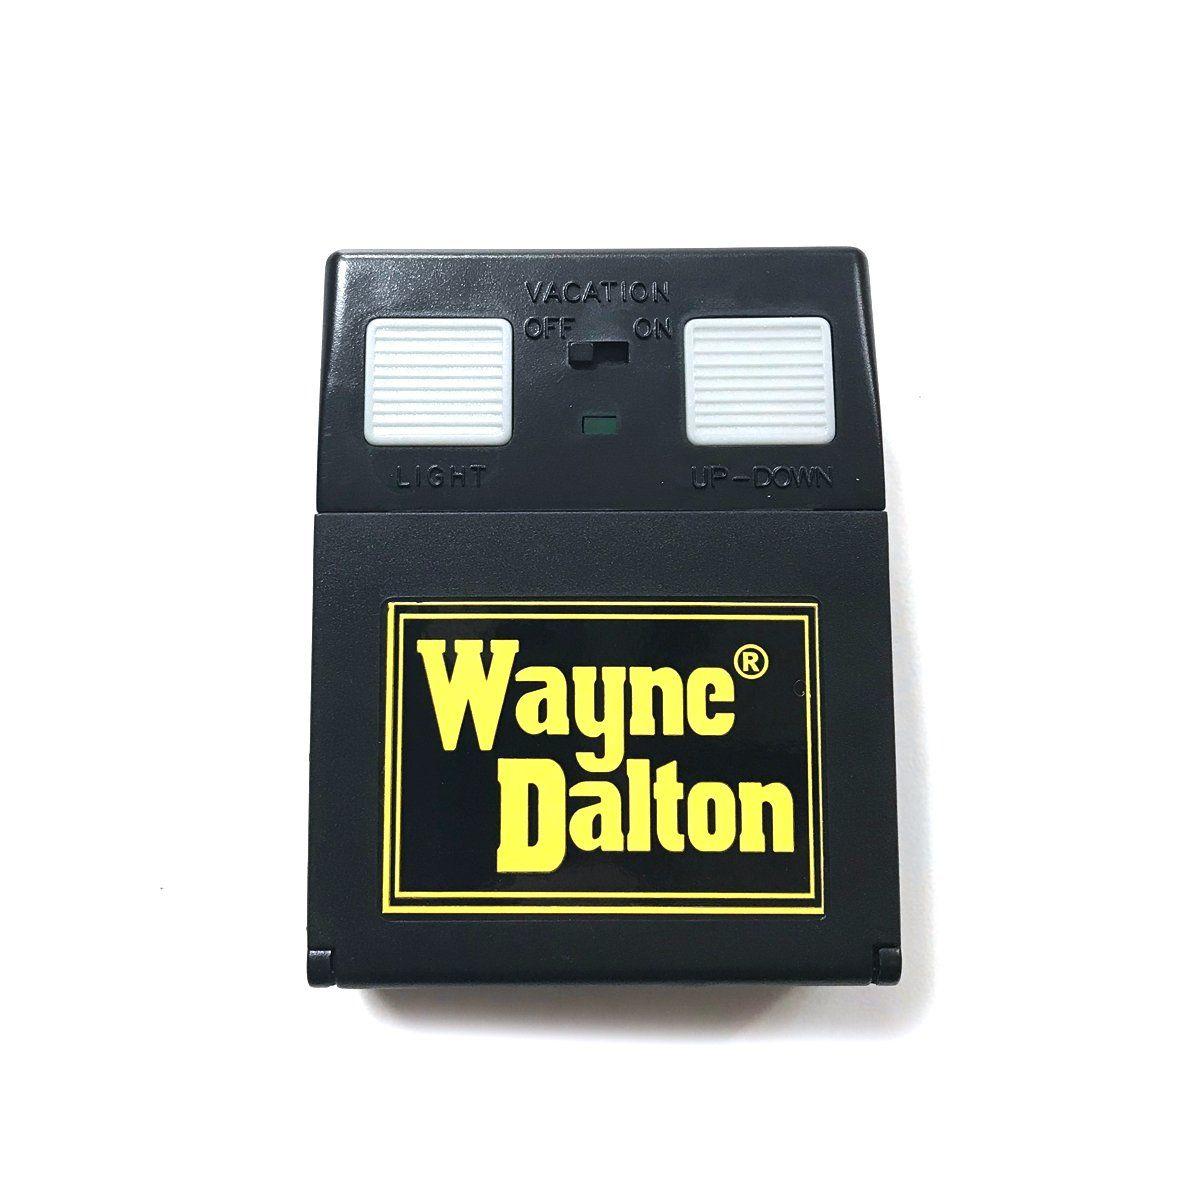 medium resolution of wayne dalton wireless wall station 297136 303 mhz wayne dalton garage doors garage door opener